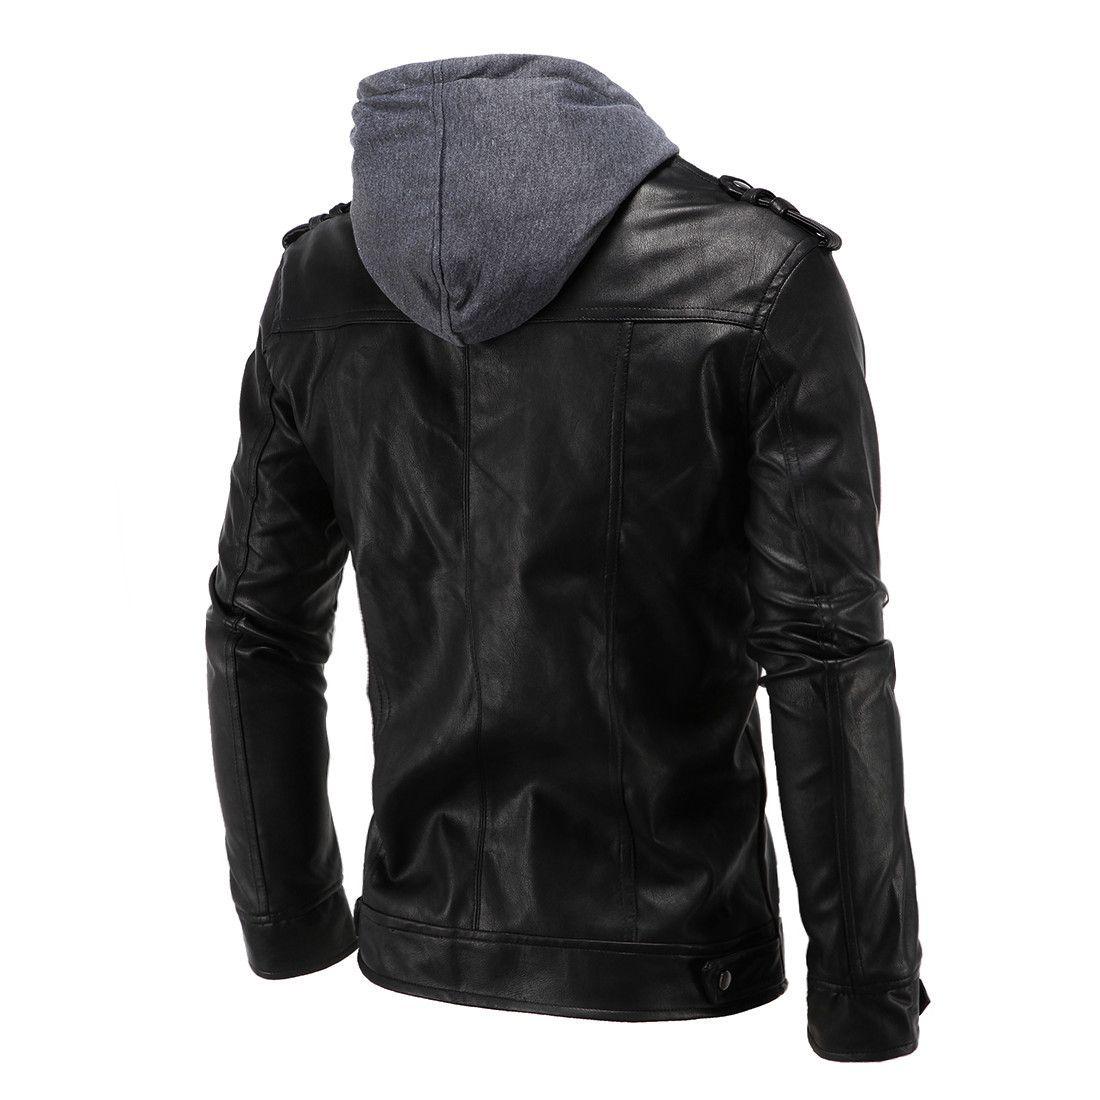 4XL толстовка Куртка для мужчин THOOO Марка мужская осень искусственная кожа куртки искусственная кожа бизнес пиджаки Slim Fit мотоцикл мужчины куртка J161017